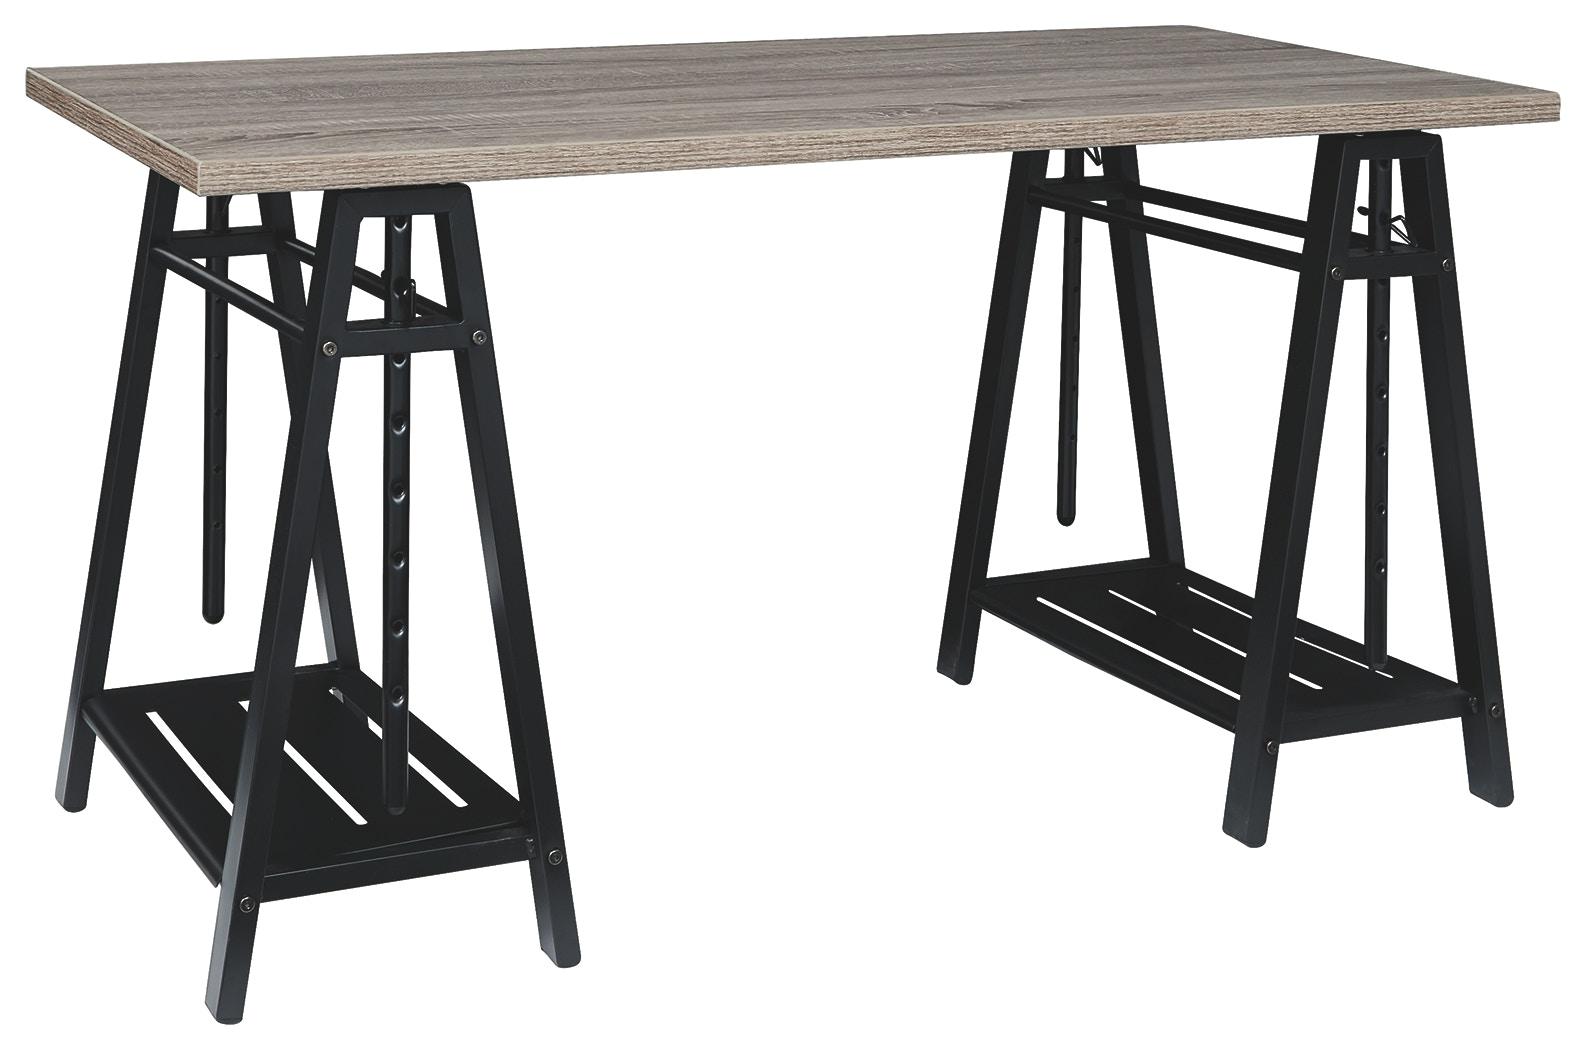 Signature Design By Ashley Home Office Irene Adjustable Height Desk Z1430261 Turner Furniture